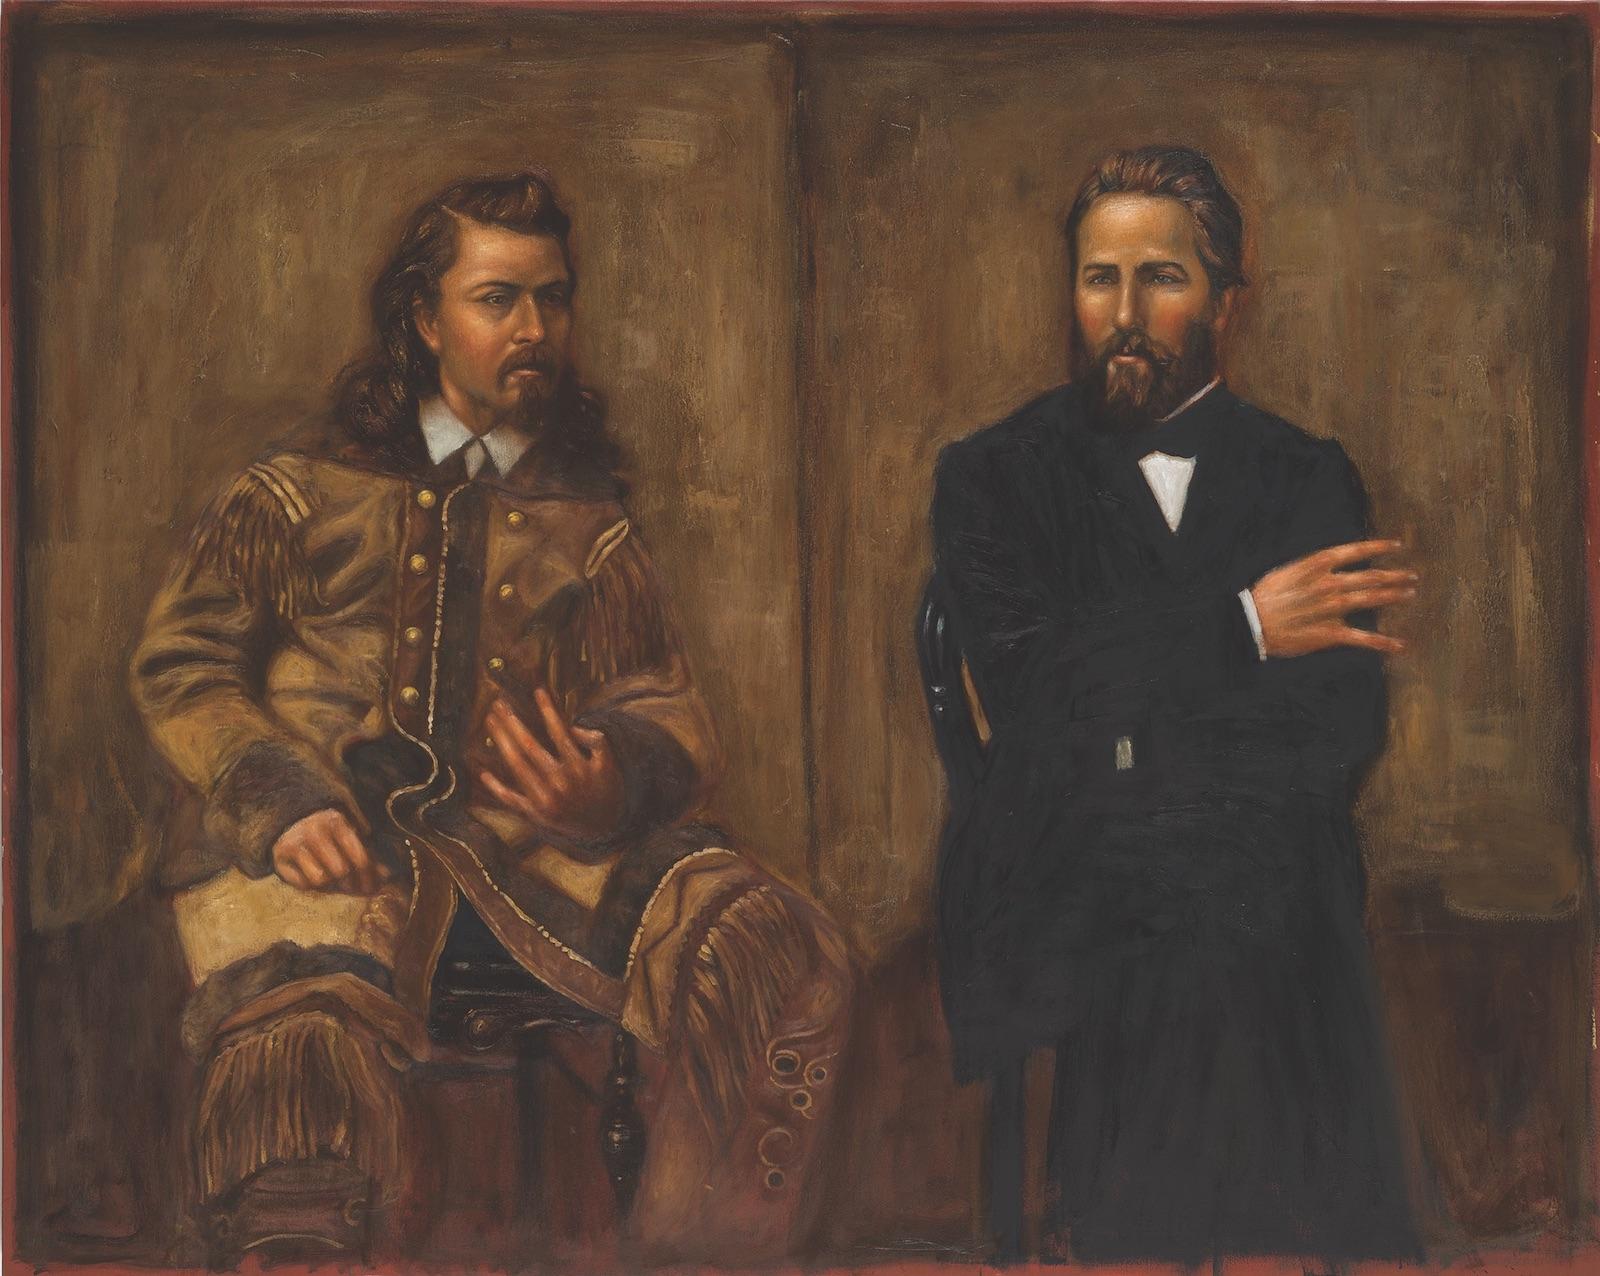 Ray Martín Abeyta, The Artist and the Showman, East Coast West Coast, Buffalo Bill and Herman Melville